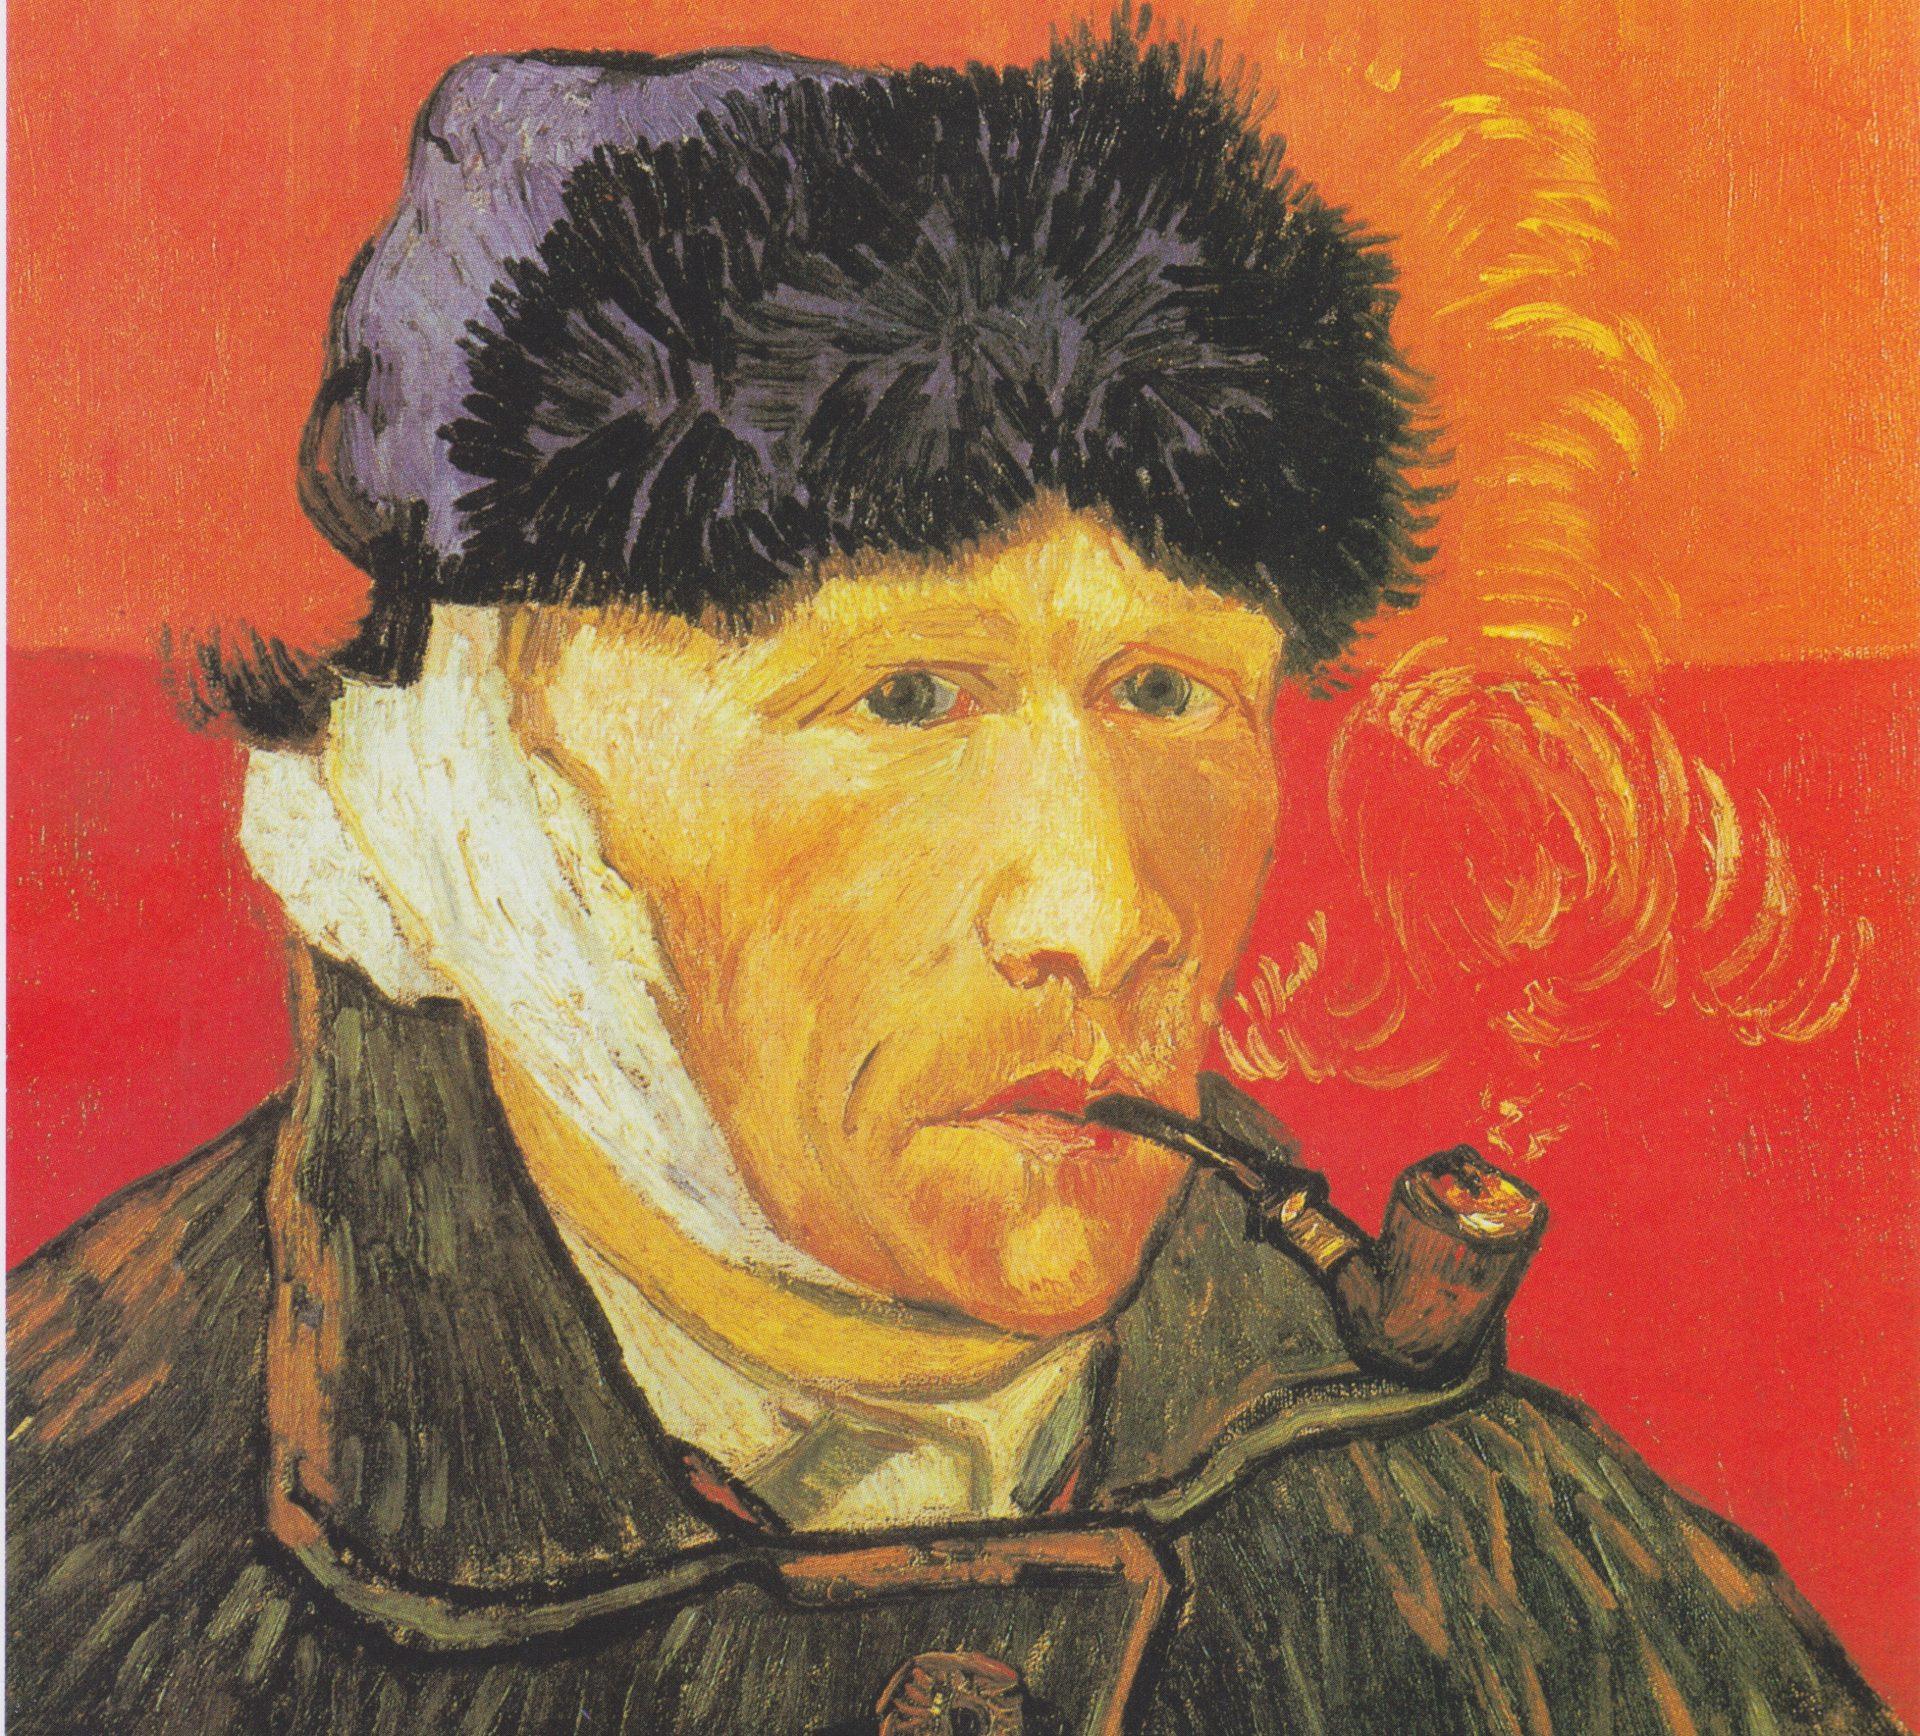 Vincent van Gogh, Selbstbildnis mit verbundenem Ohr